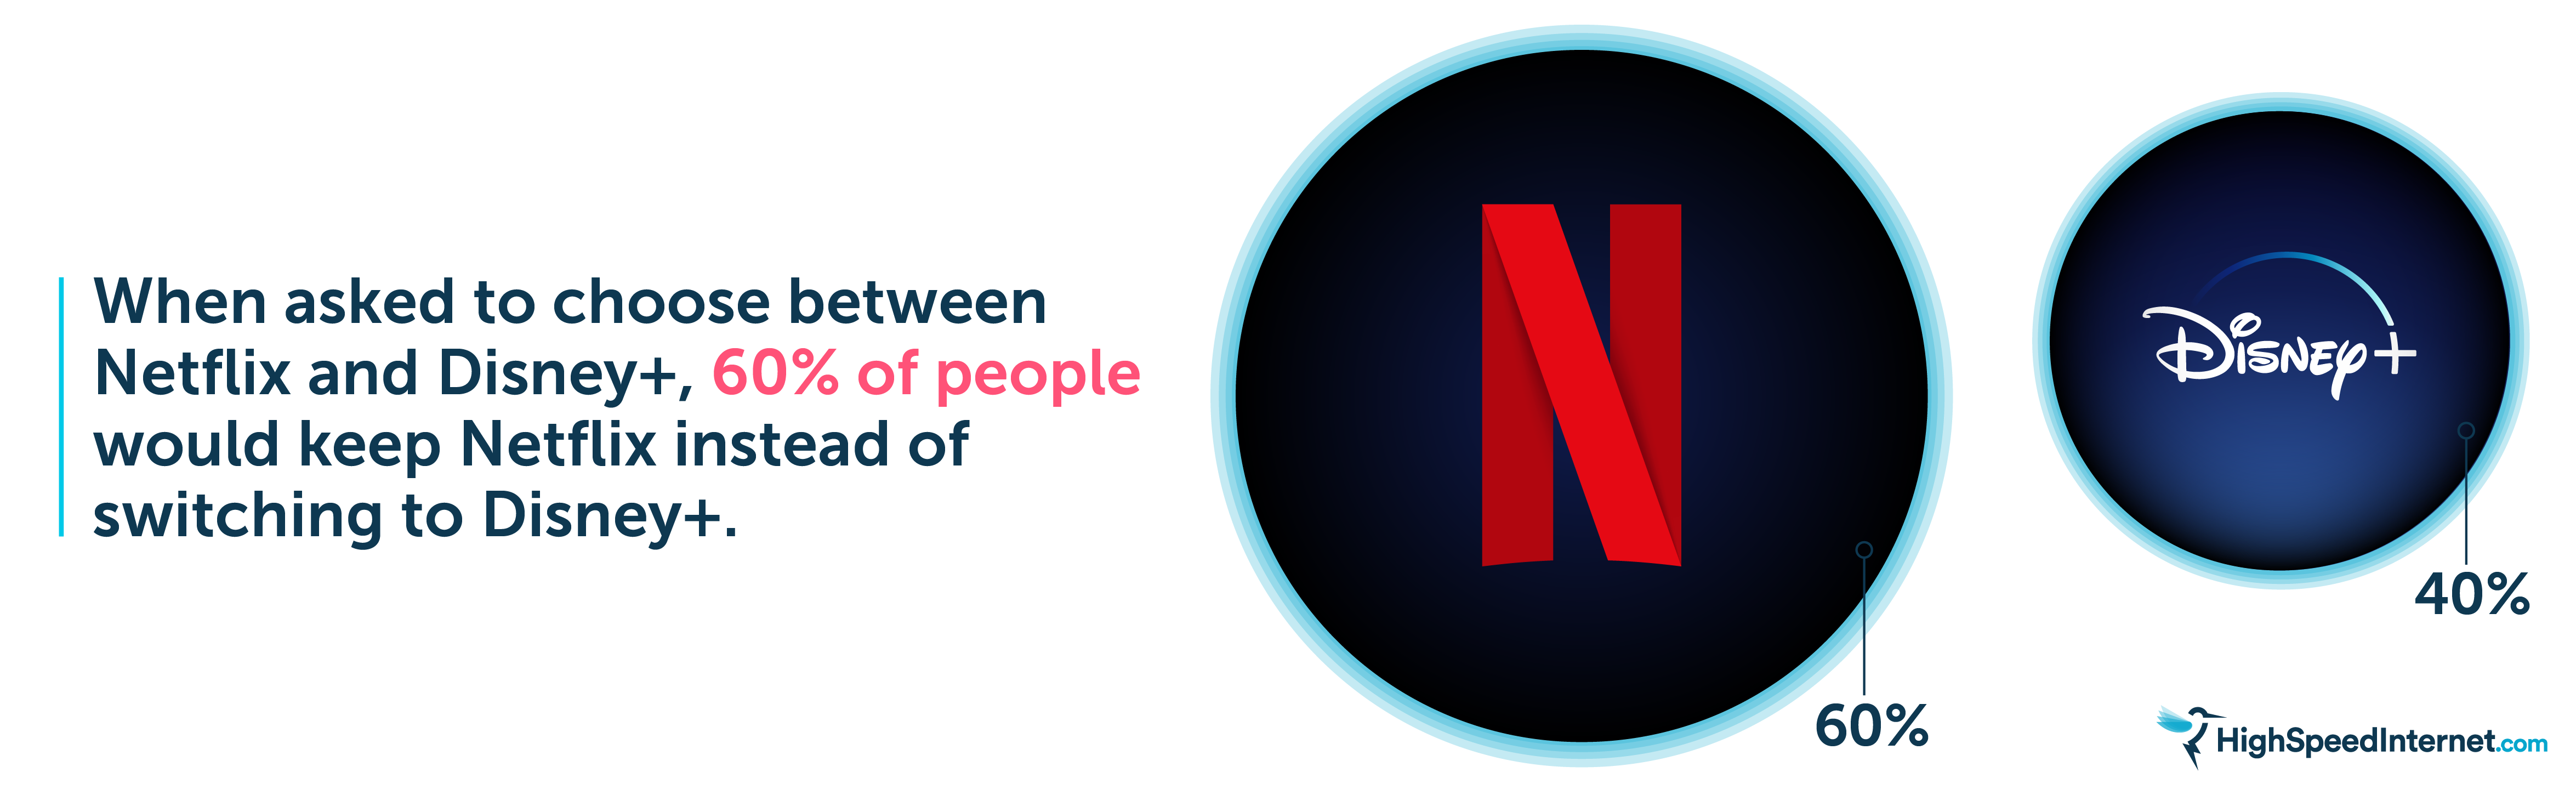 60% Choose Netflix